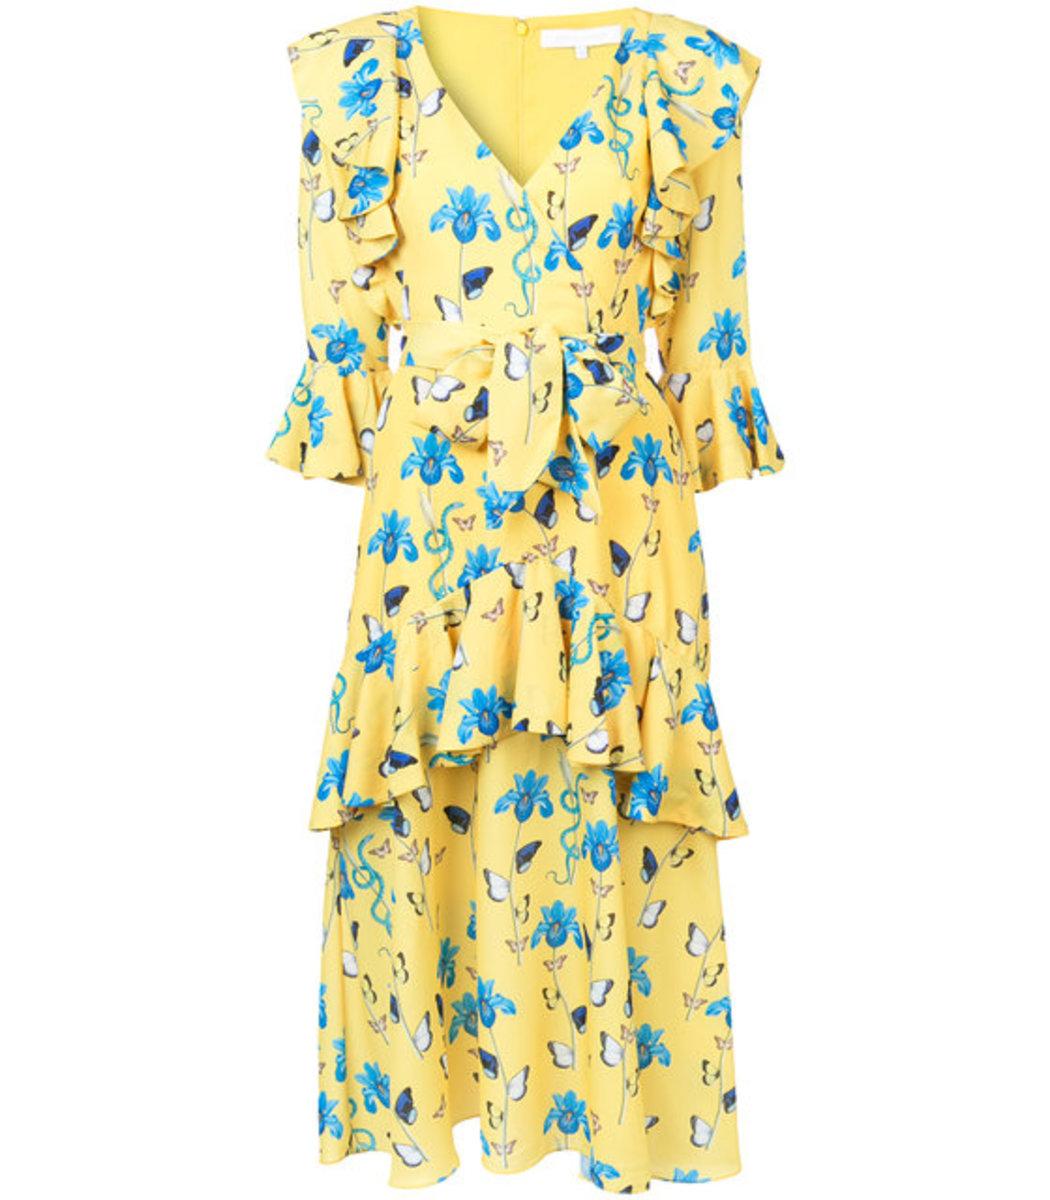 Borgo De Nor Ruffled Floral Print Dress